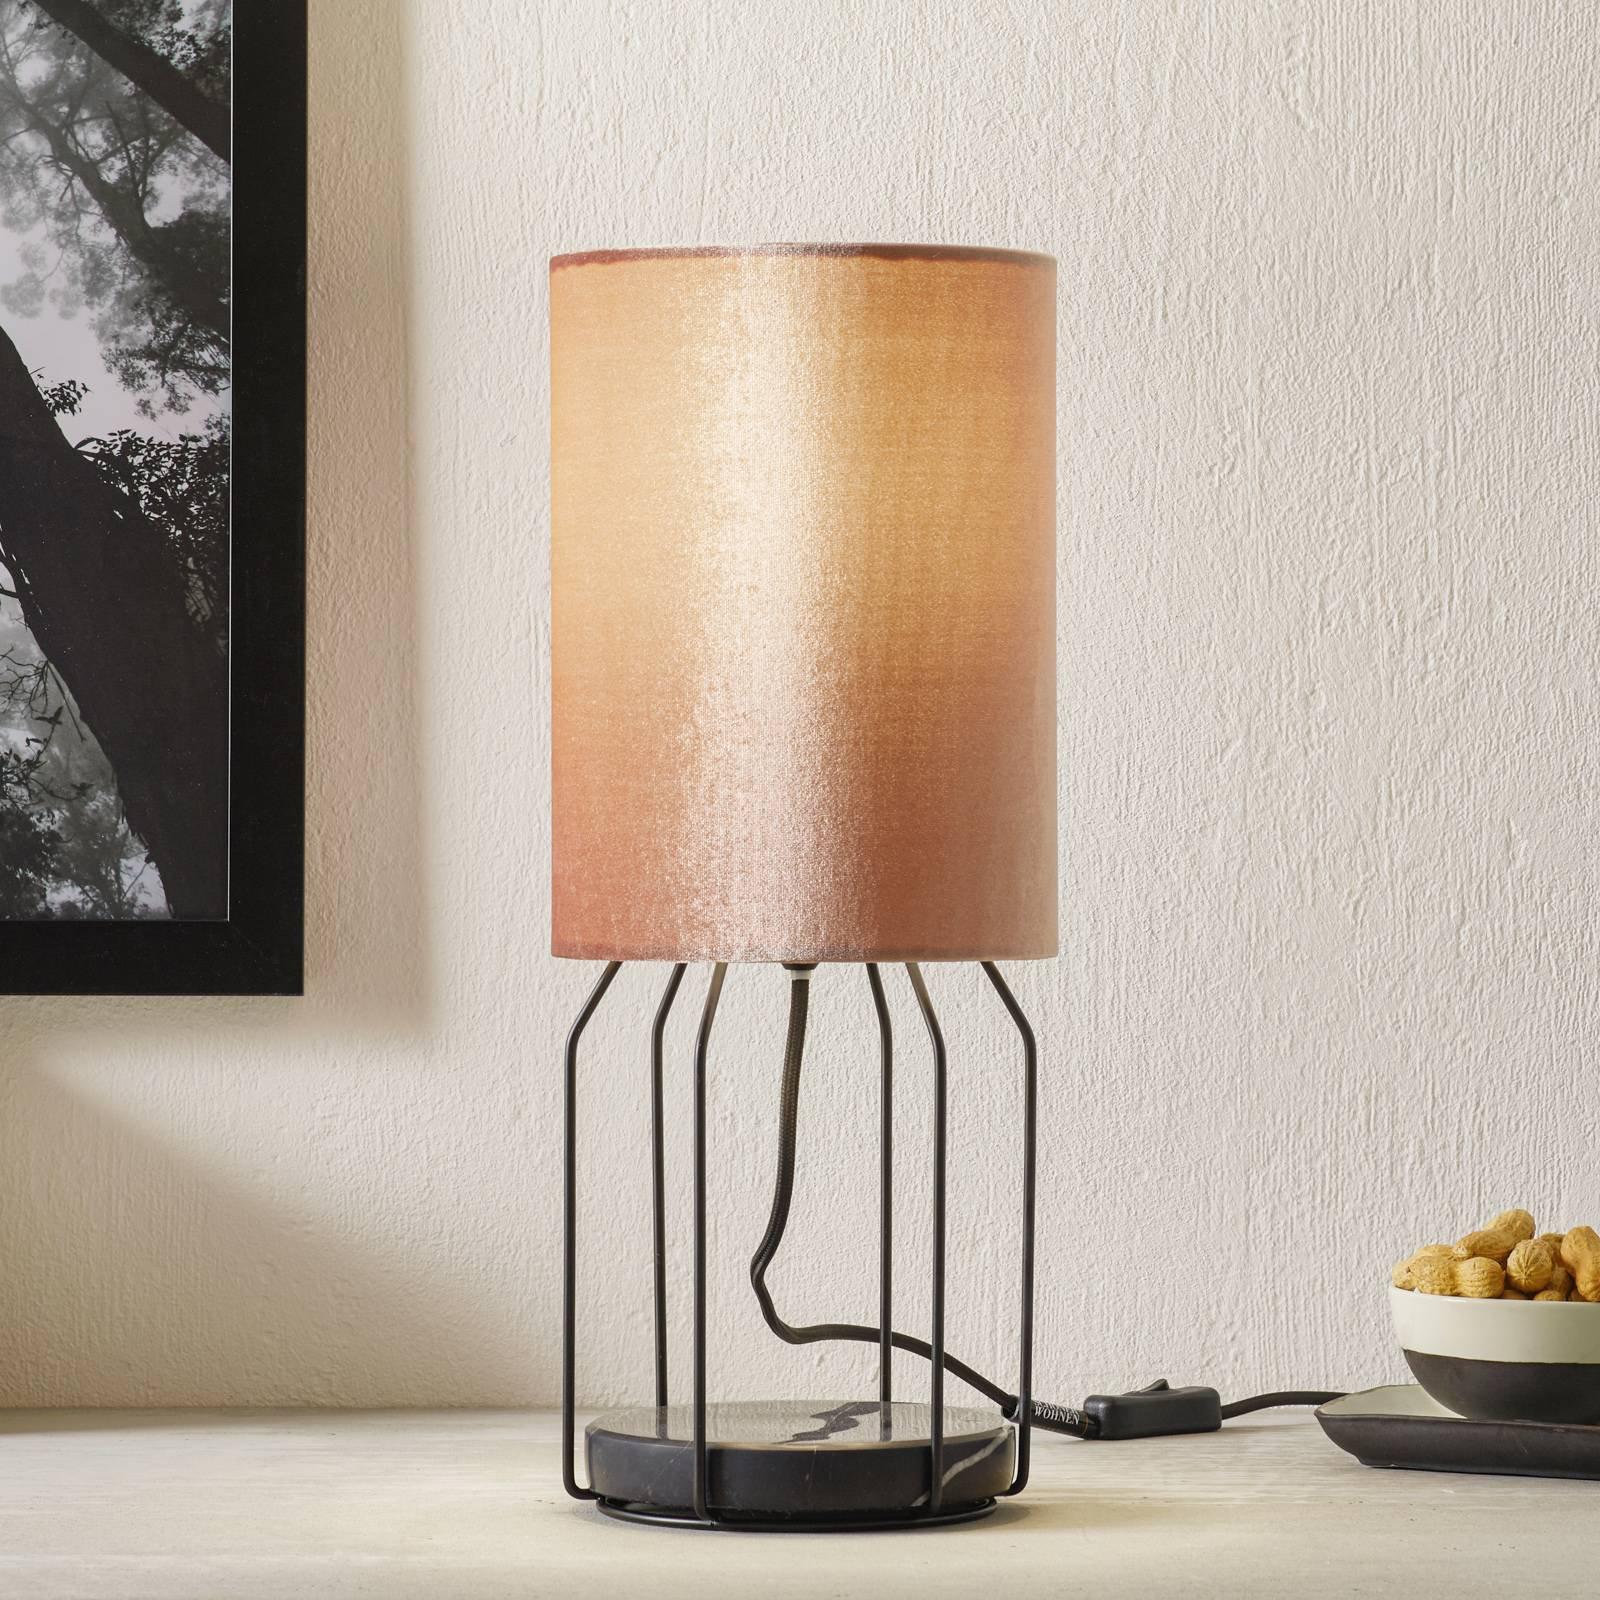 Schöner Wohnen Grace bordlampe, rosé